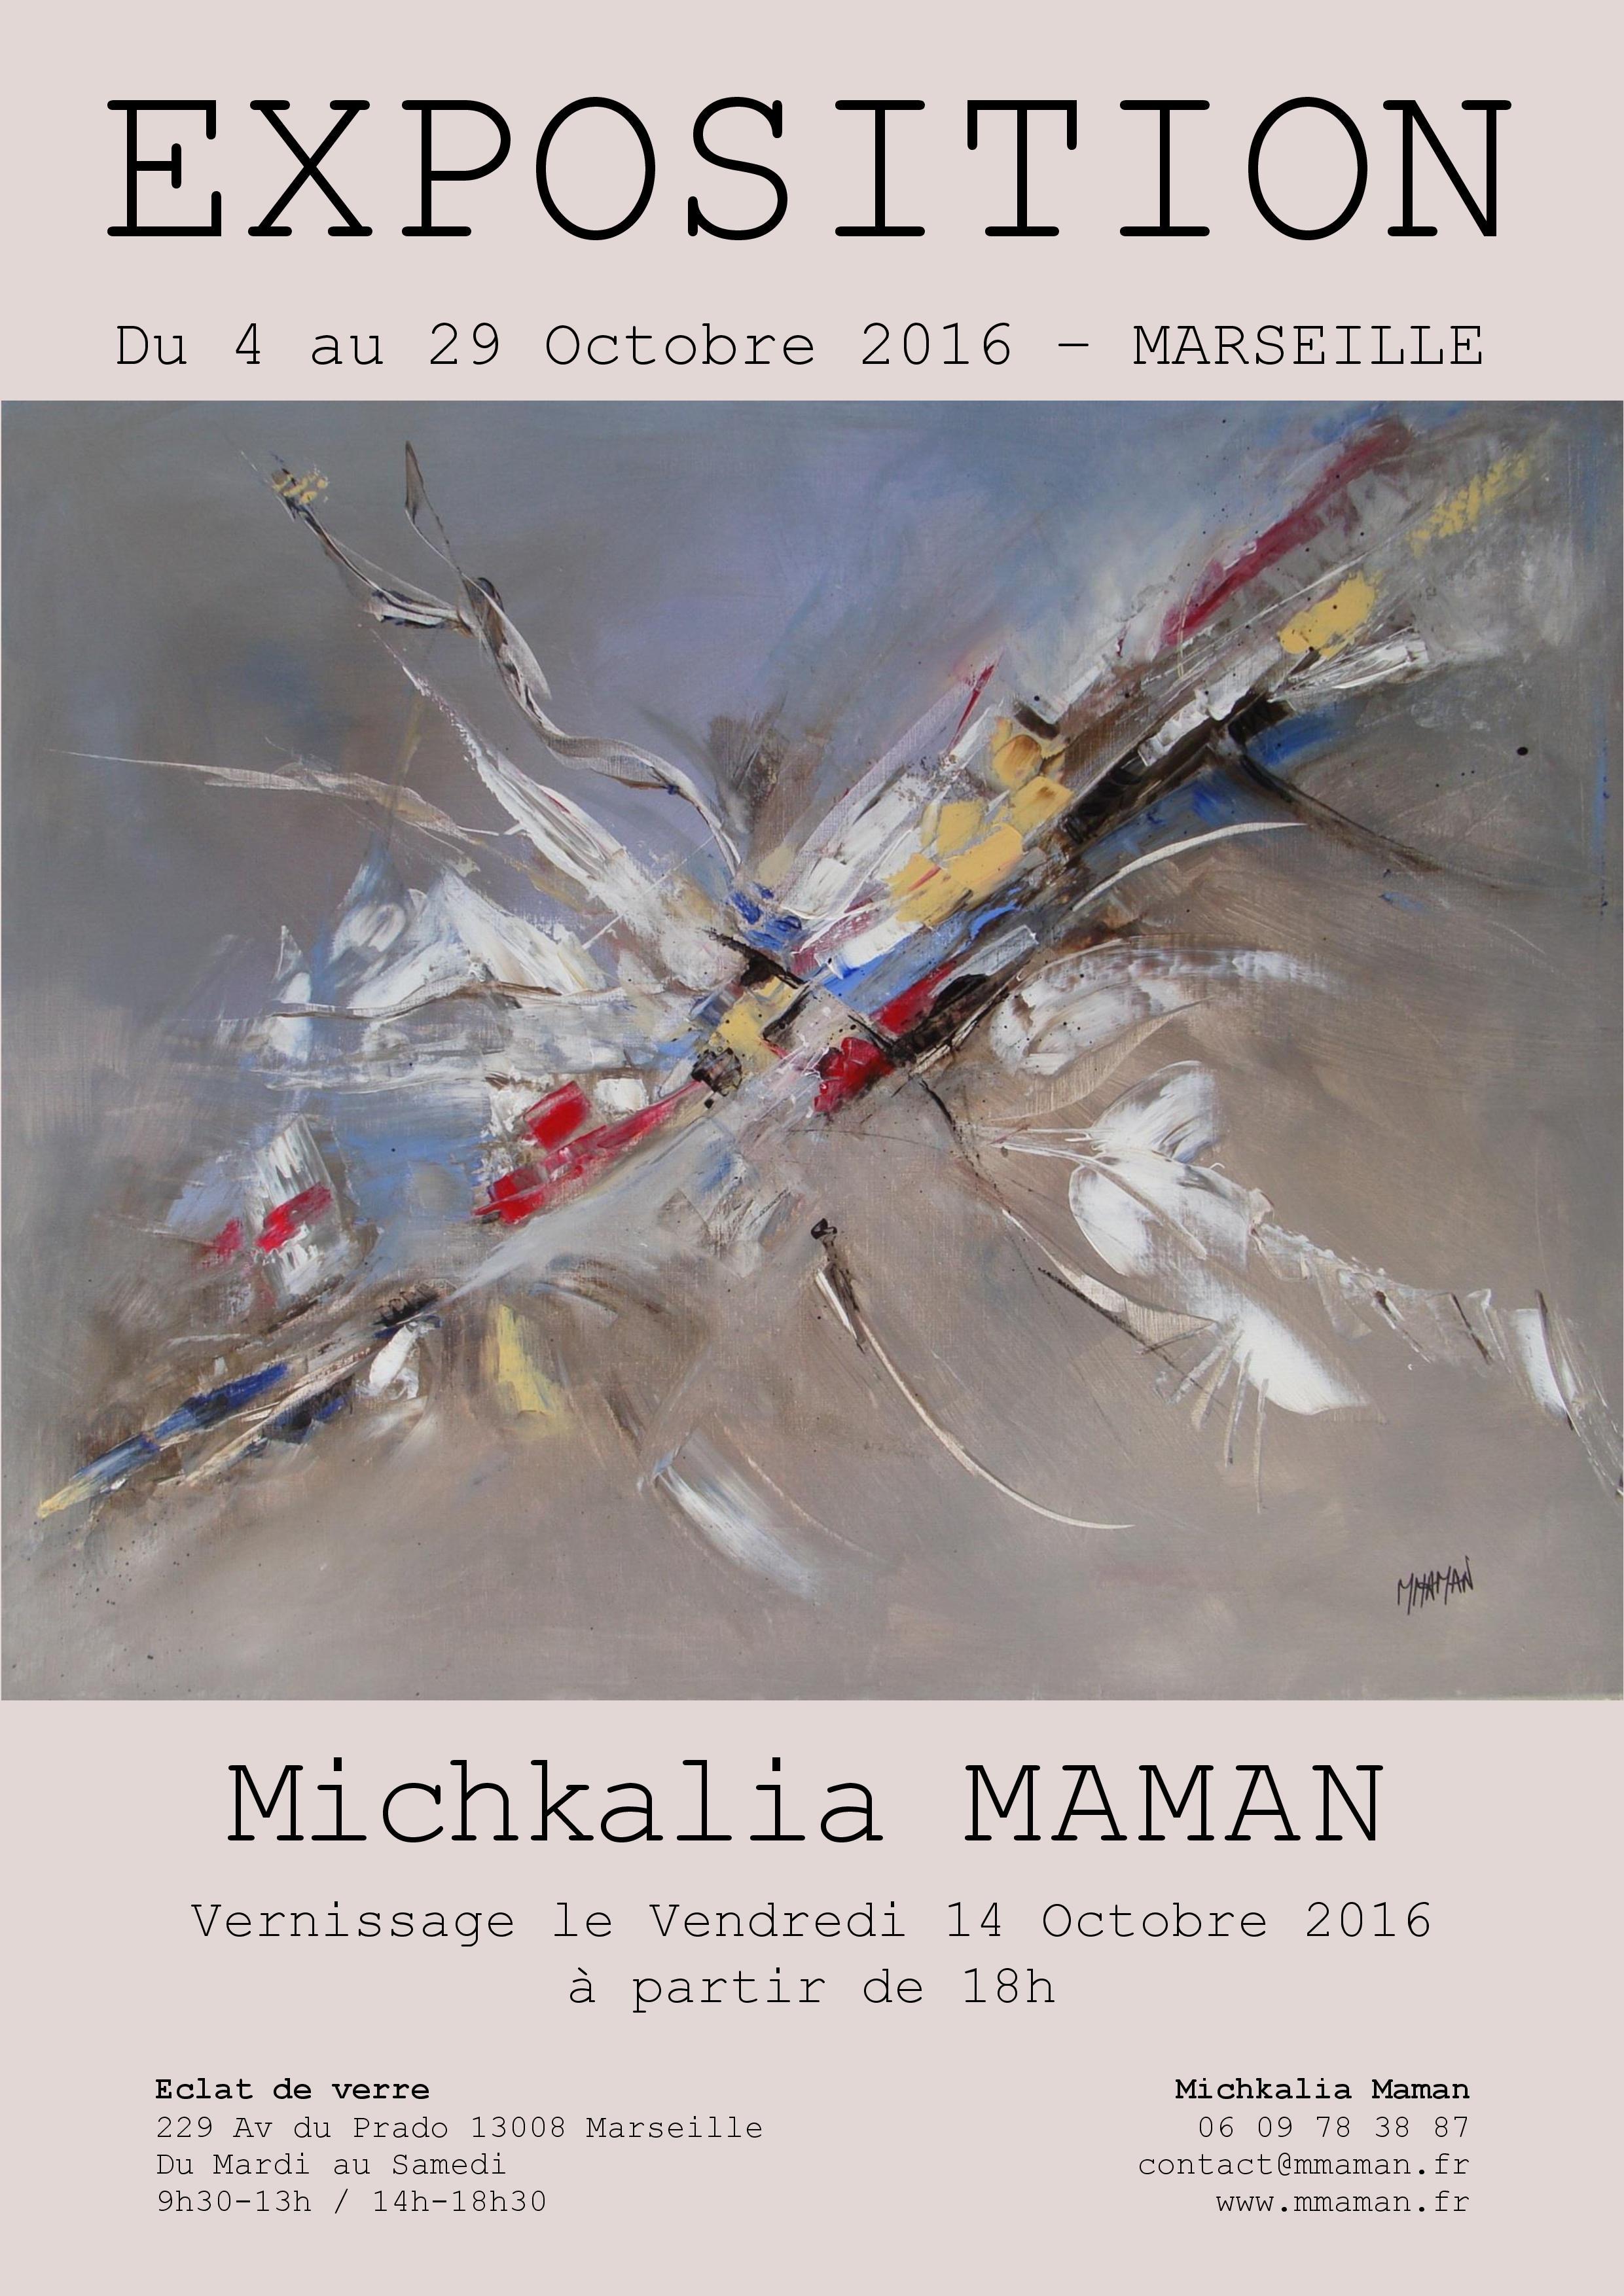 Michkalia Maman